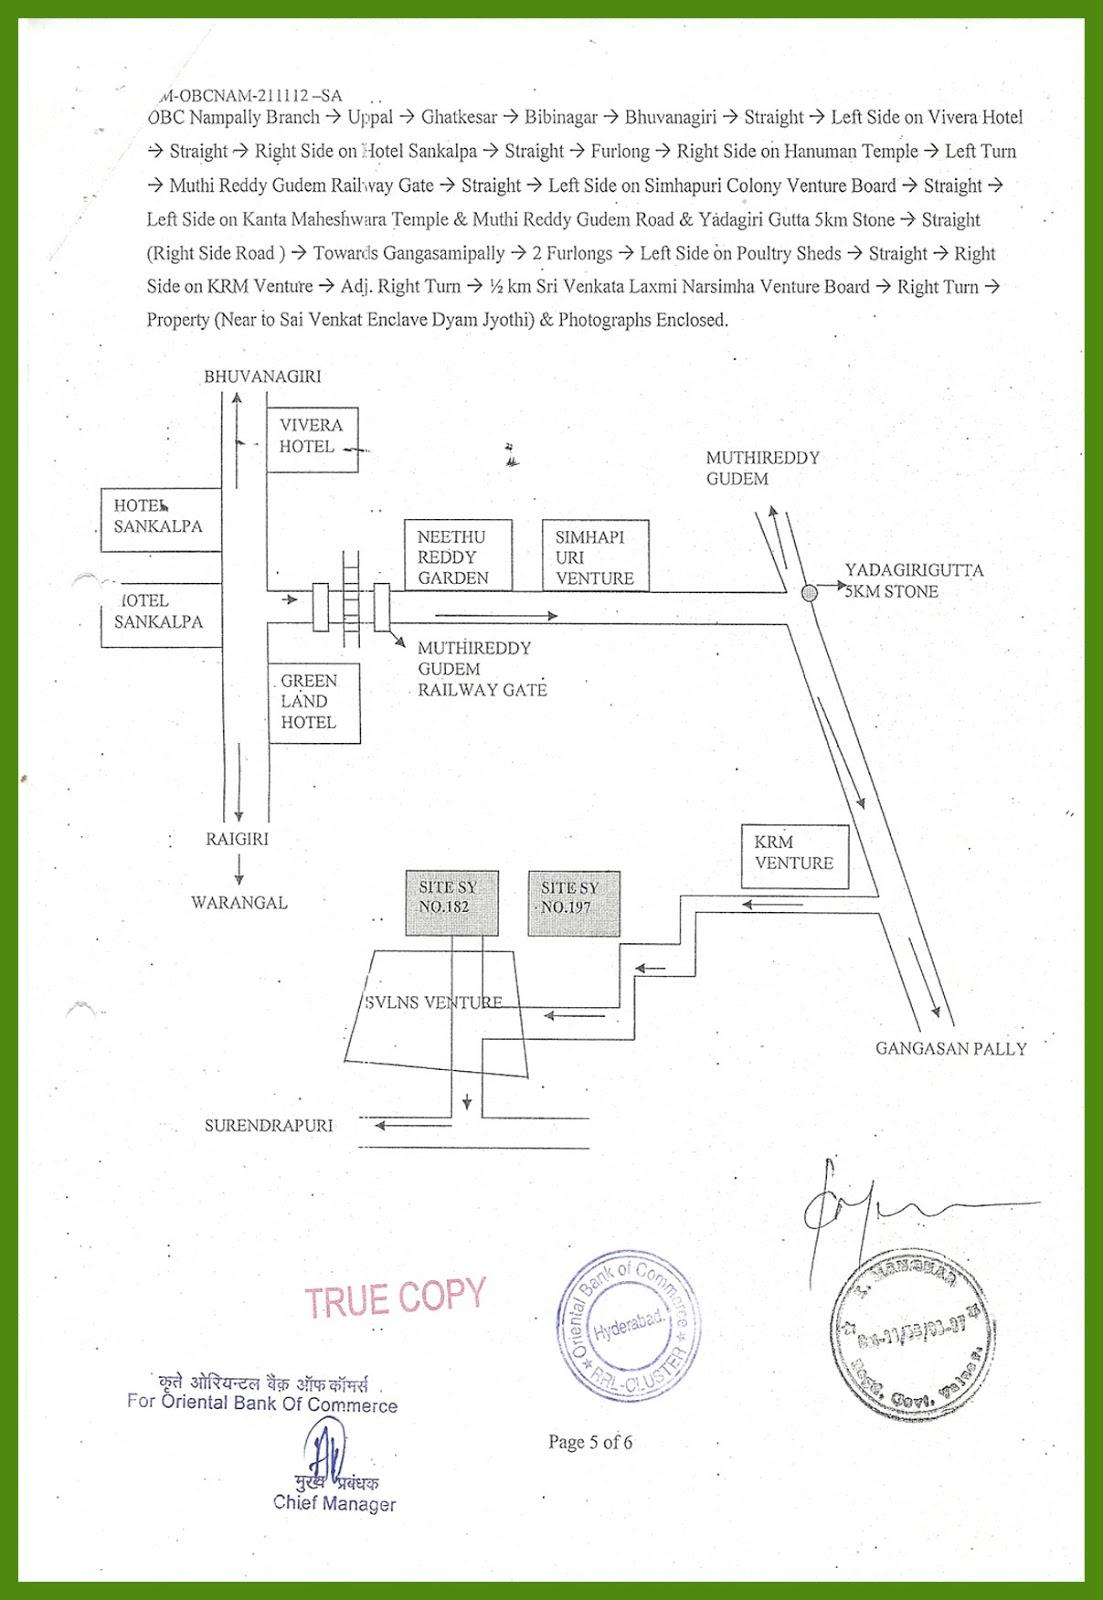 Survey No. 182 and 197 at Yadadri-Bhuvanagiri district-7